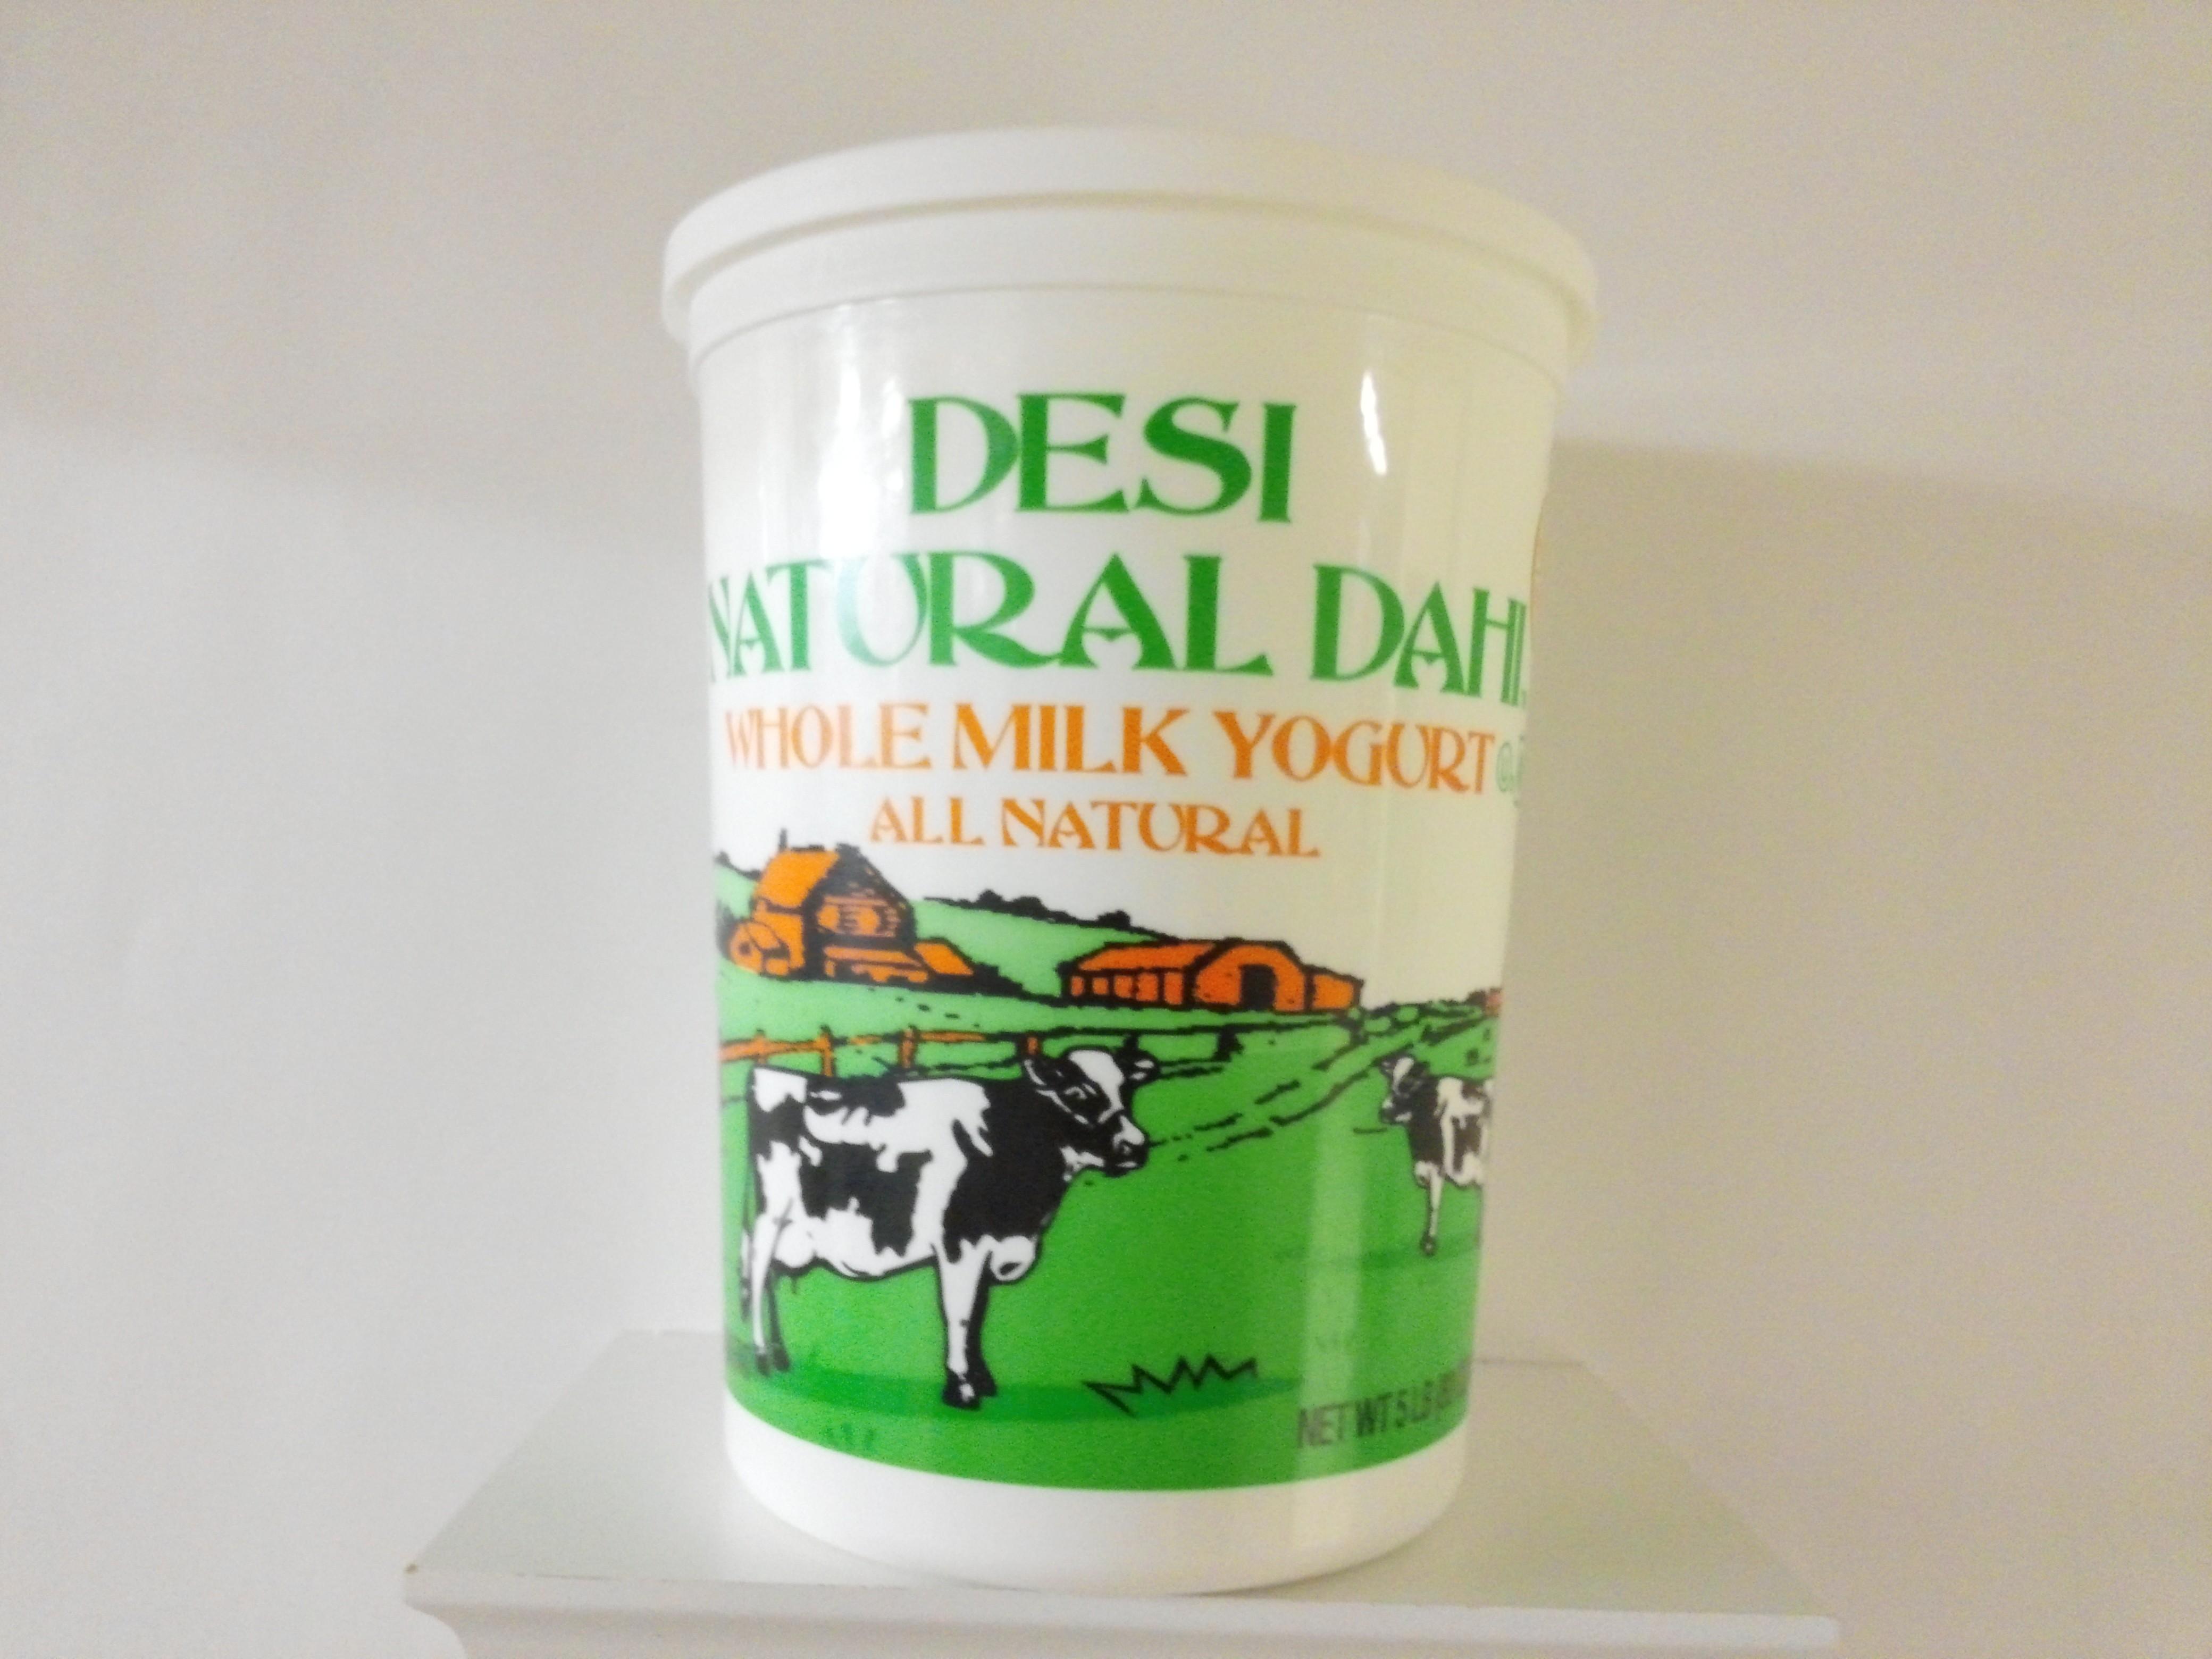 Desi Whole Milk Yogurt 5 lbs